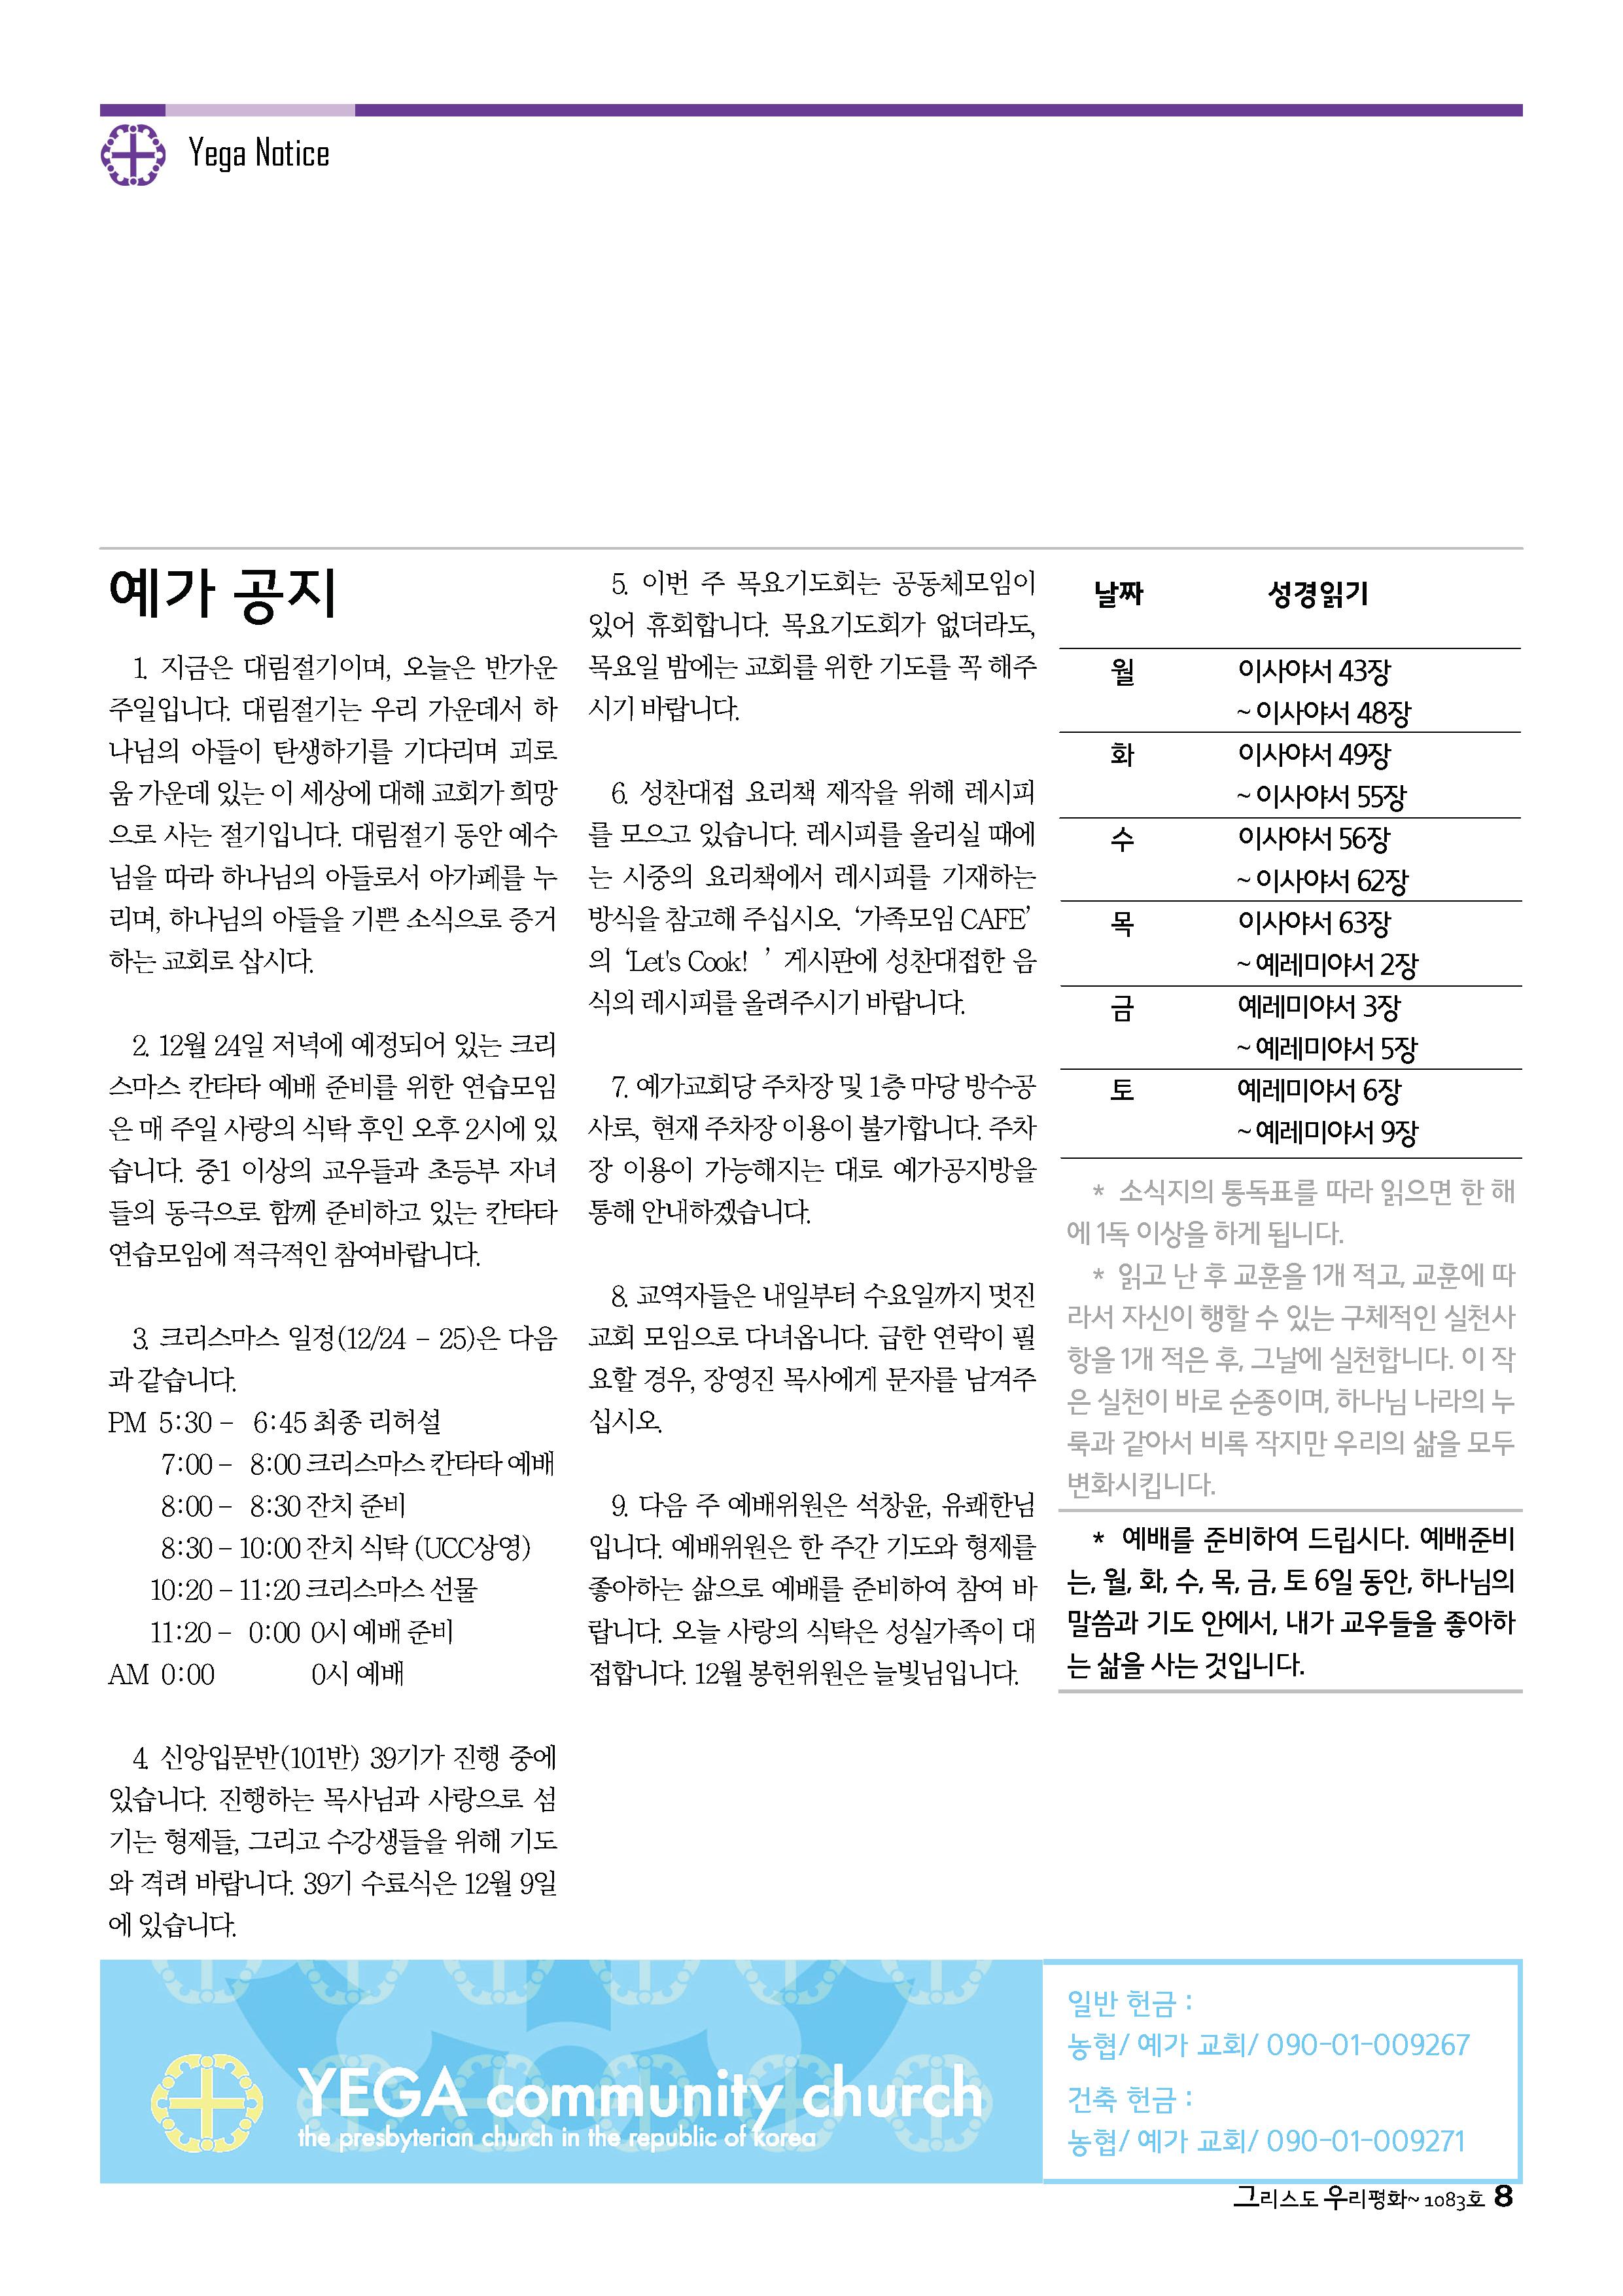 18sdjb1202_페이지_8.png